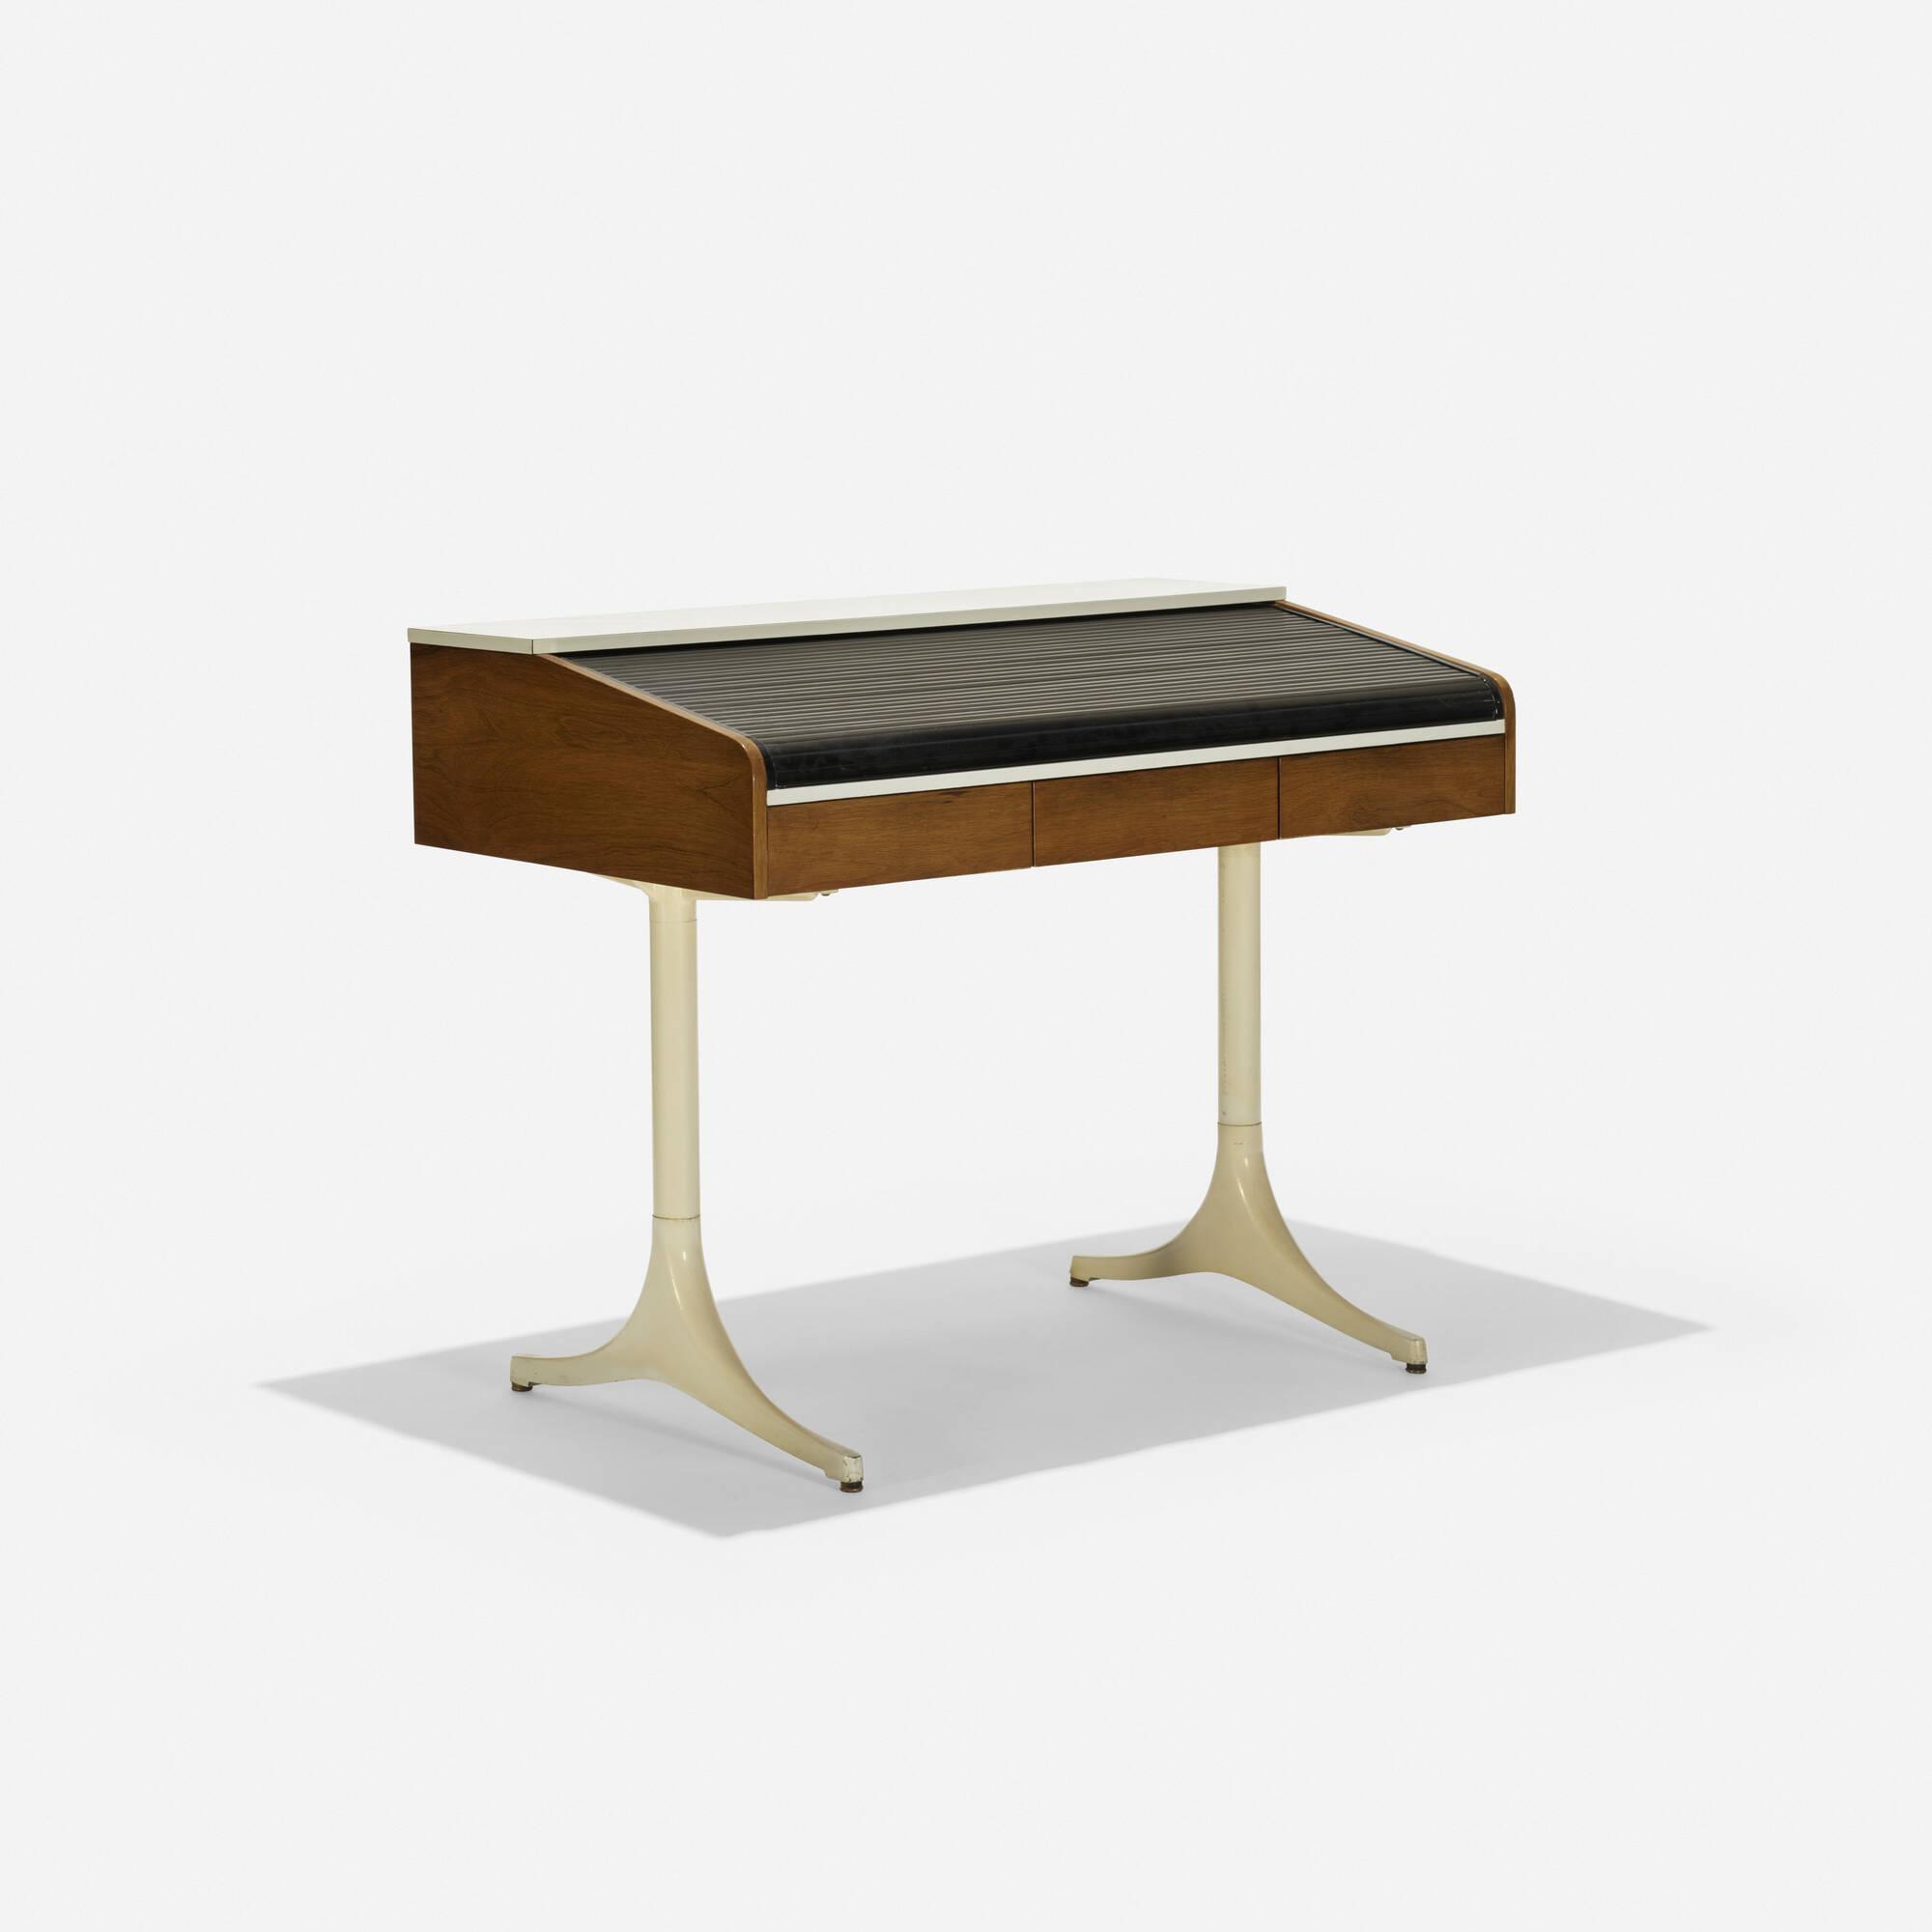 141: George Nelson & Associates / Roll Top desk, model 5496 (1 of 3)